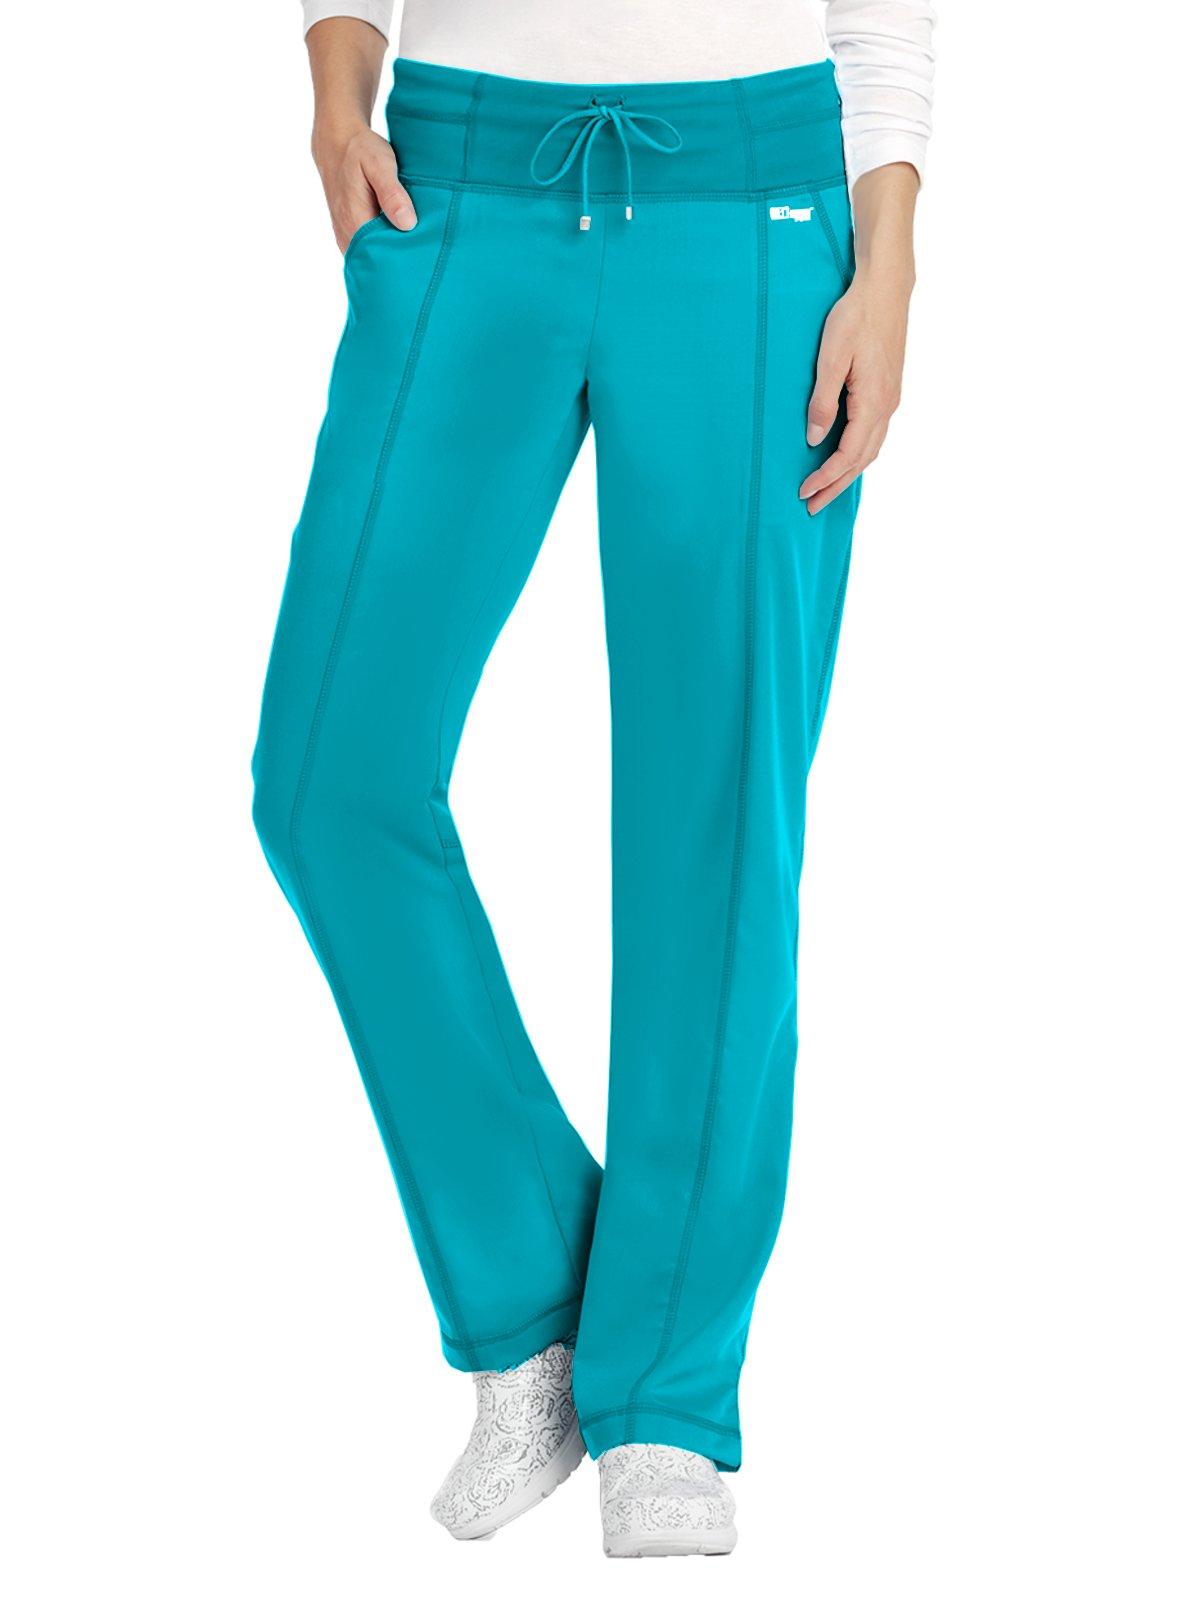 Grey's Anatomy Active 4276 Yoga Pant Teal S Petite